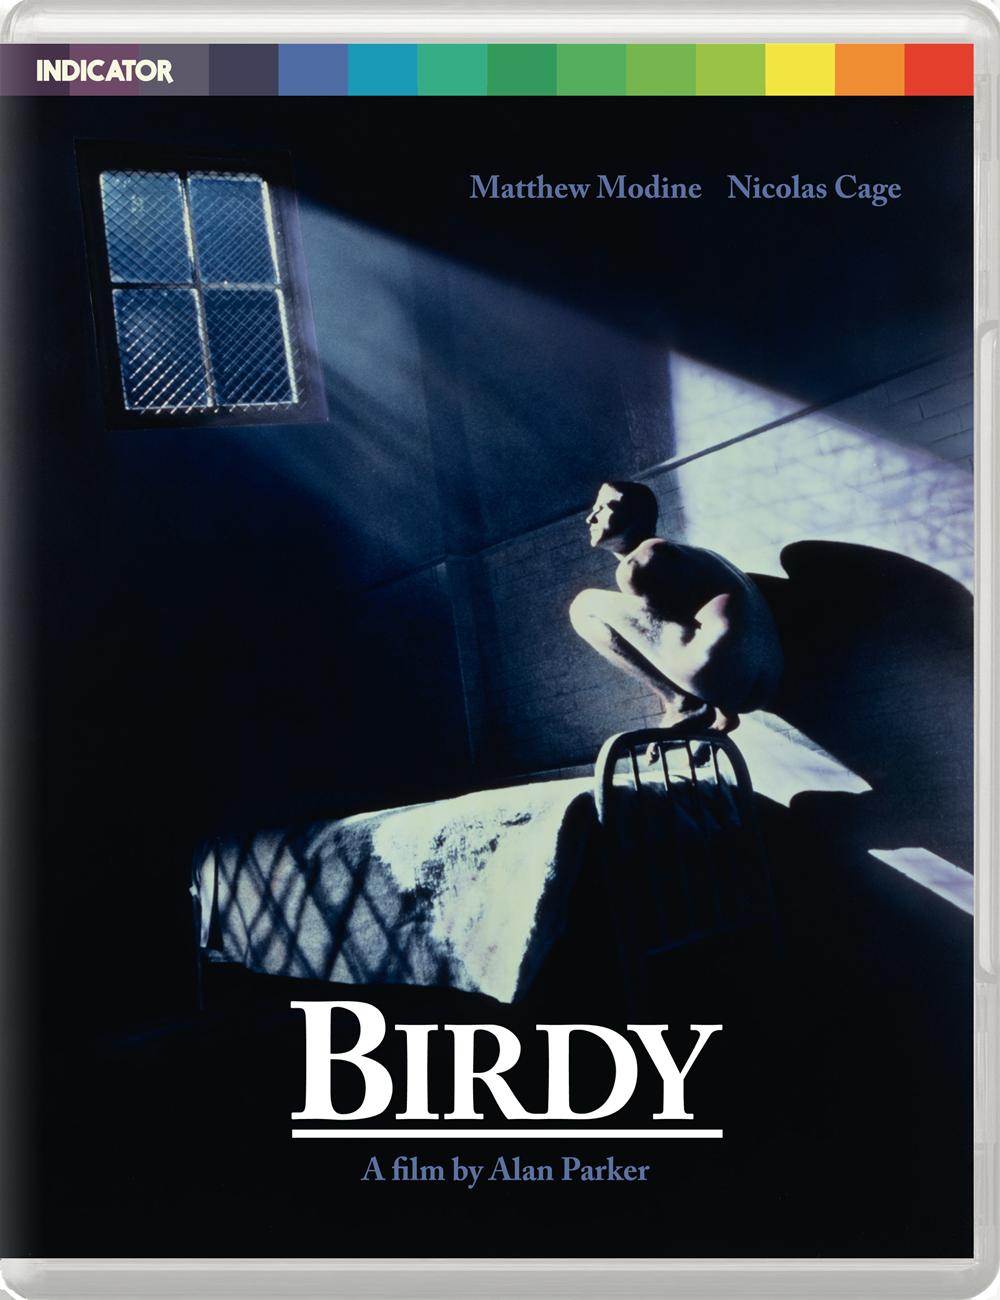 Indicator October 2019 Blu-ray Titles